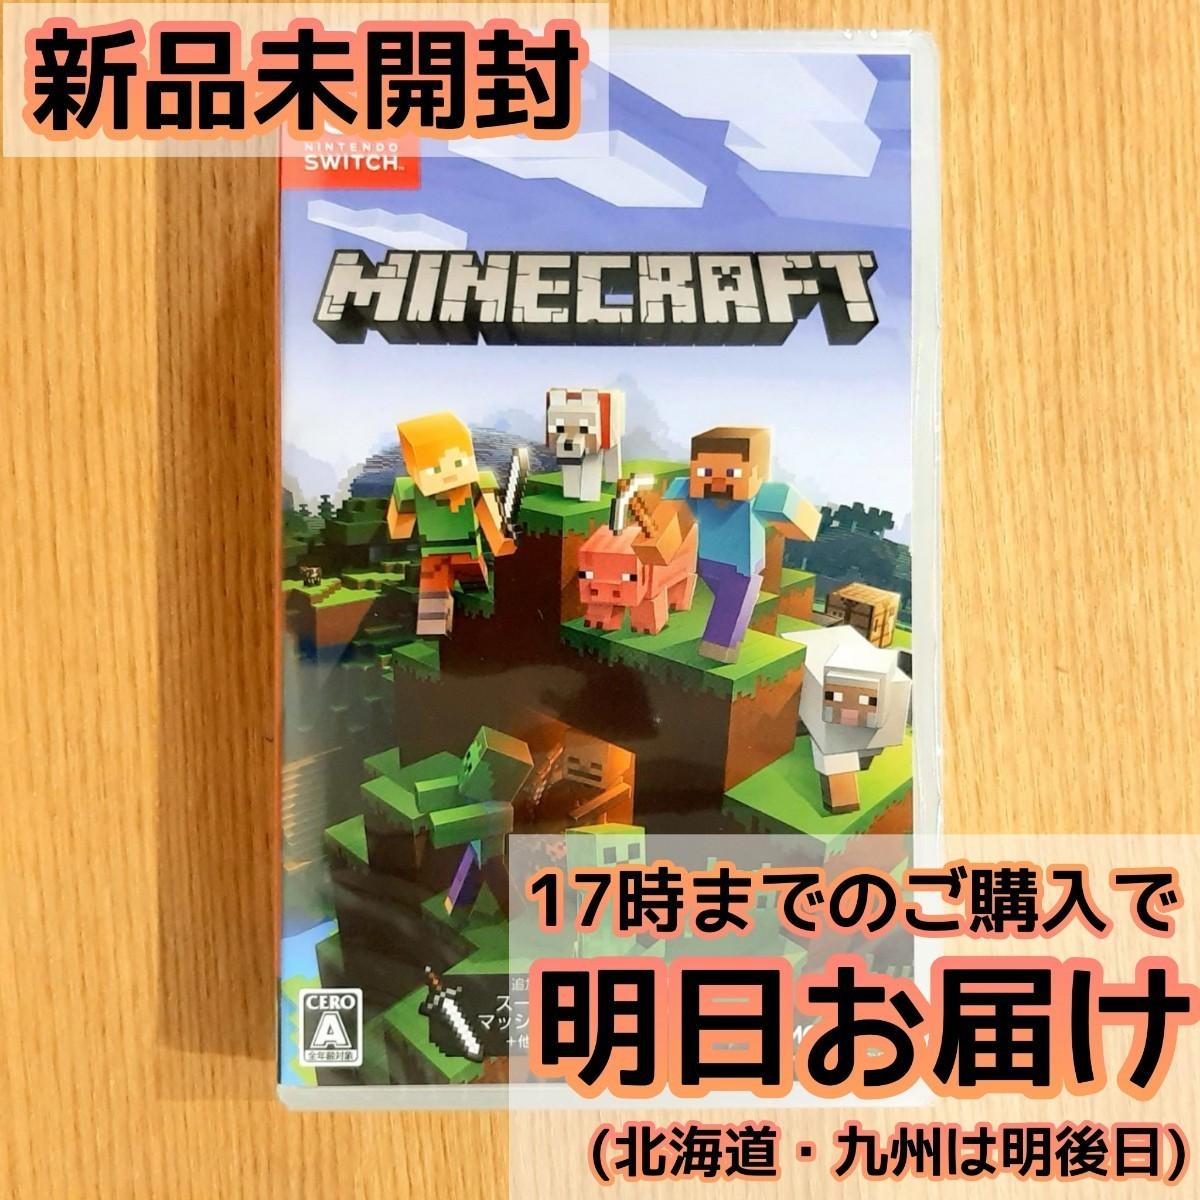 Switch マインクラフト Minecraft